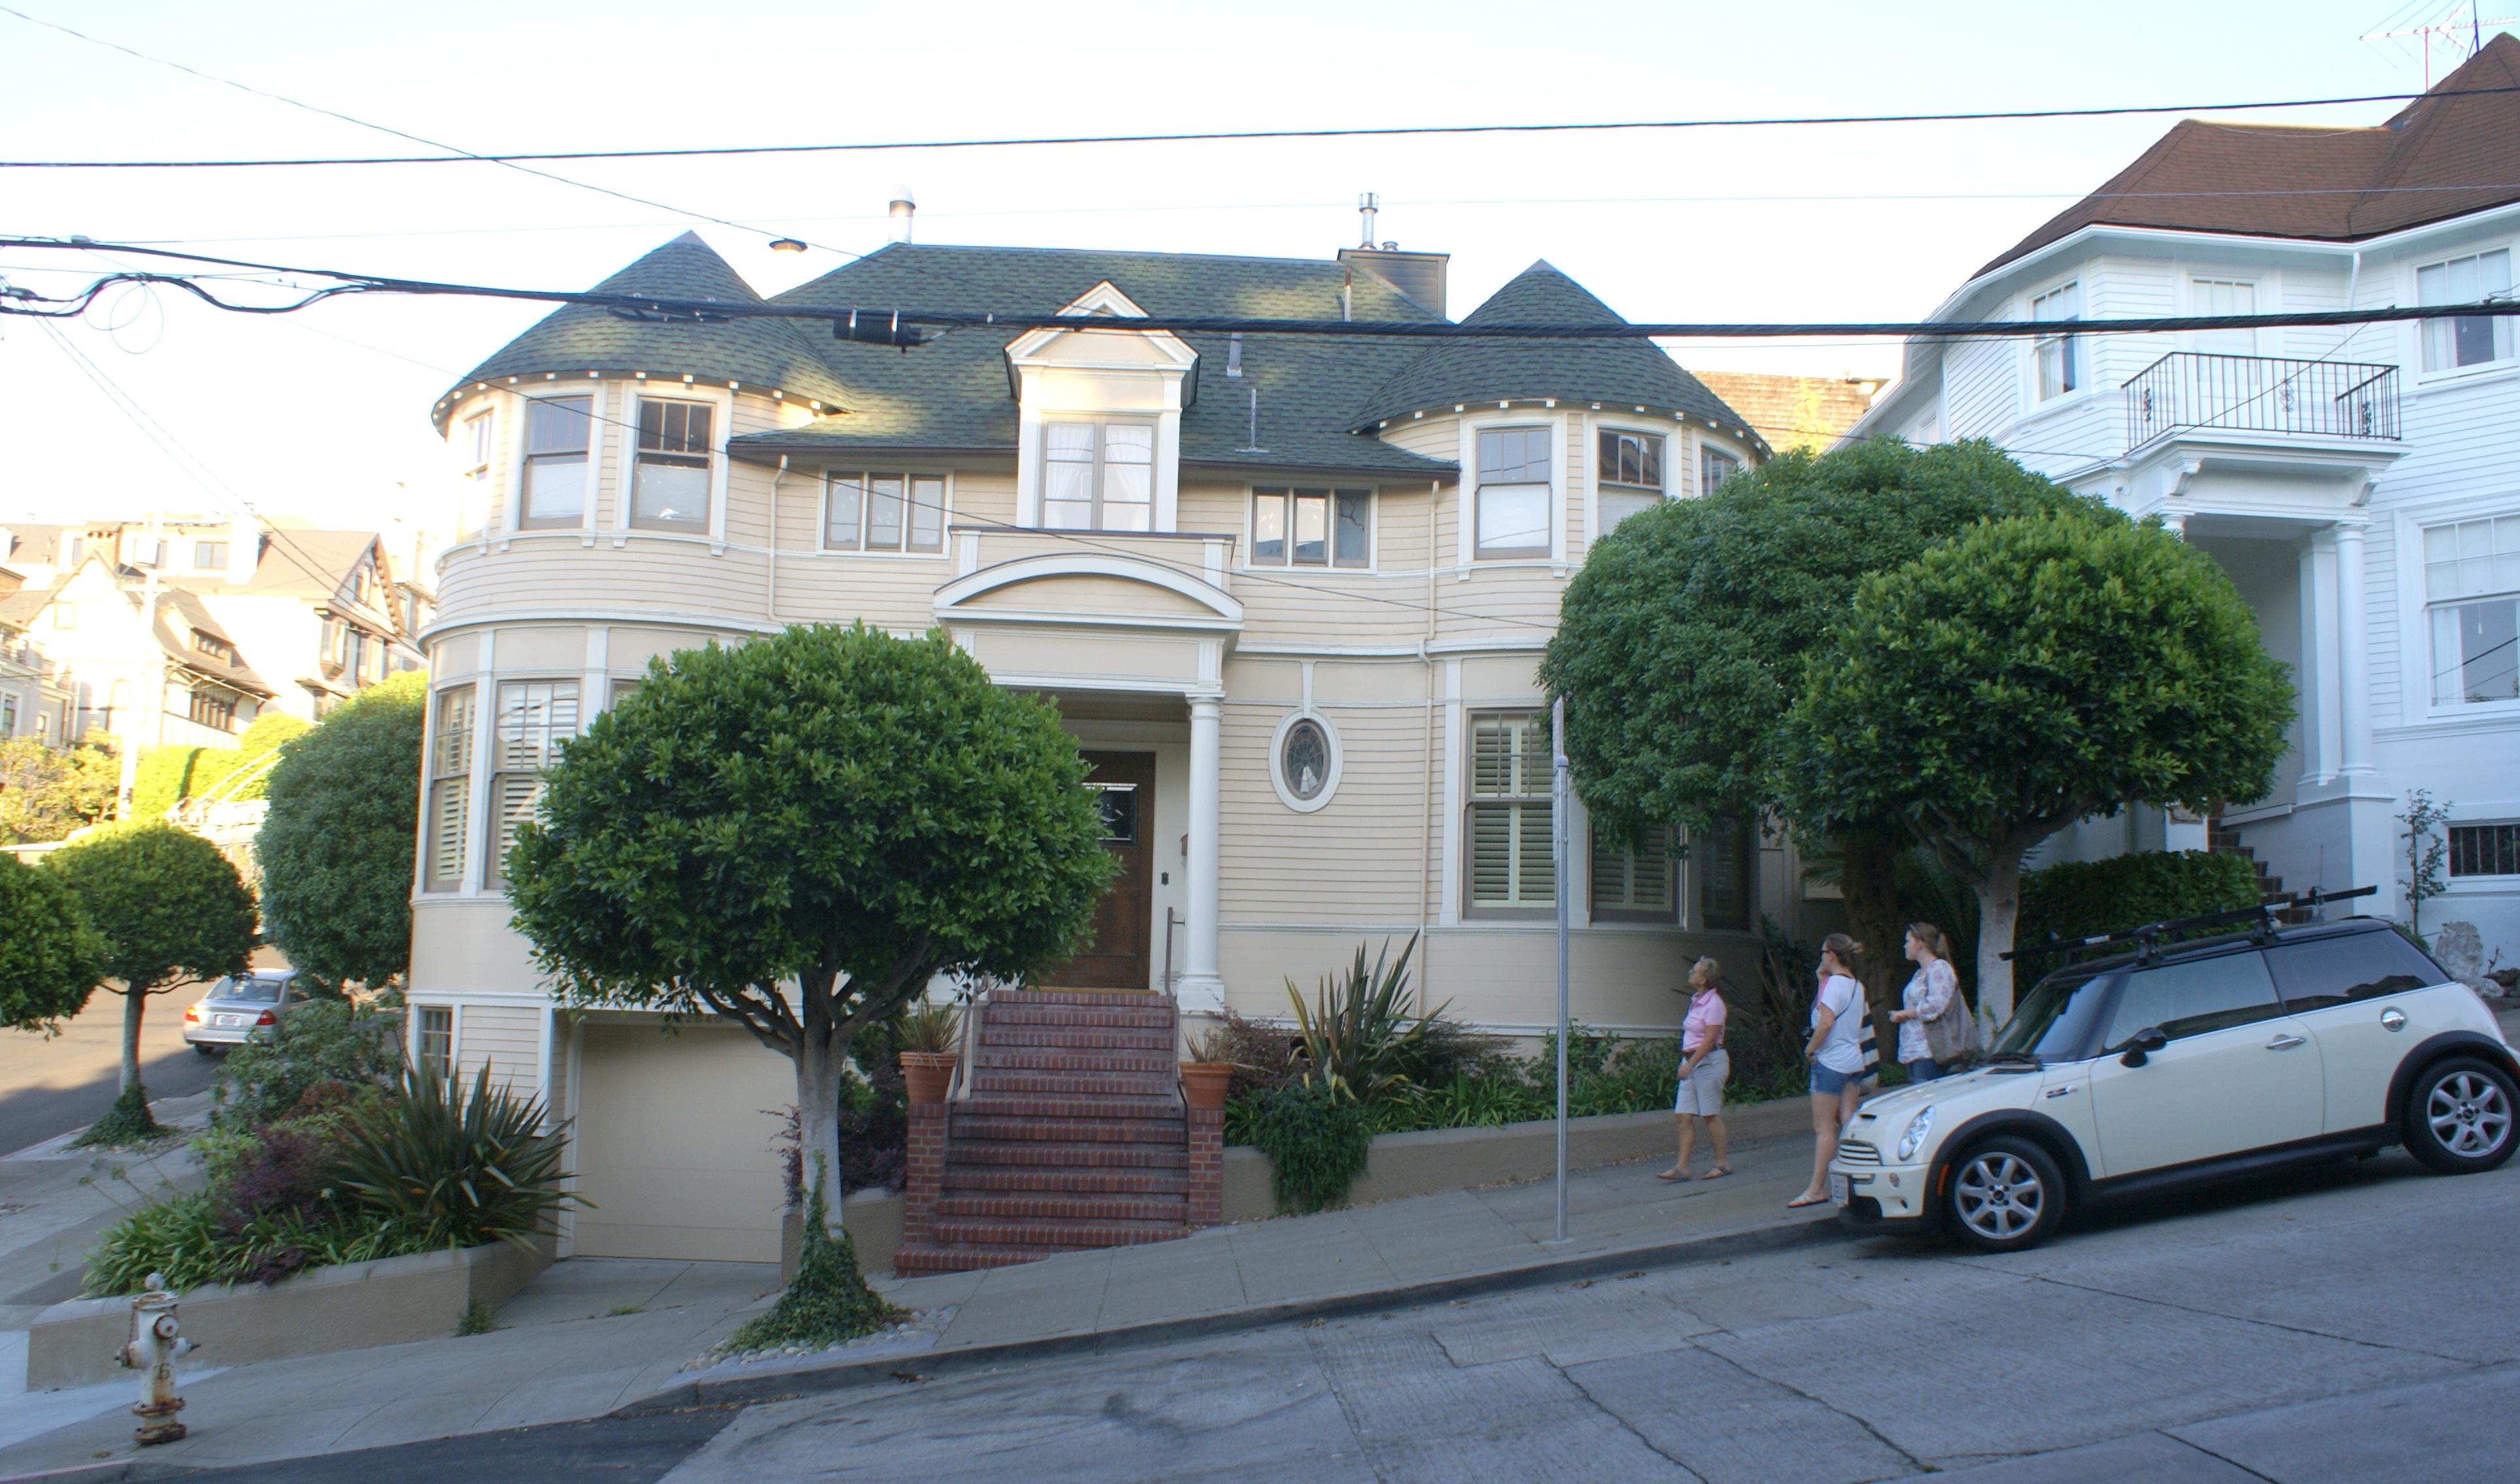 San Francisco Archive Scrapimpulse